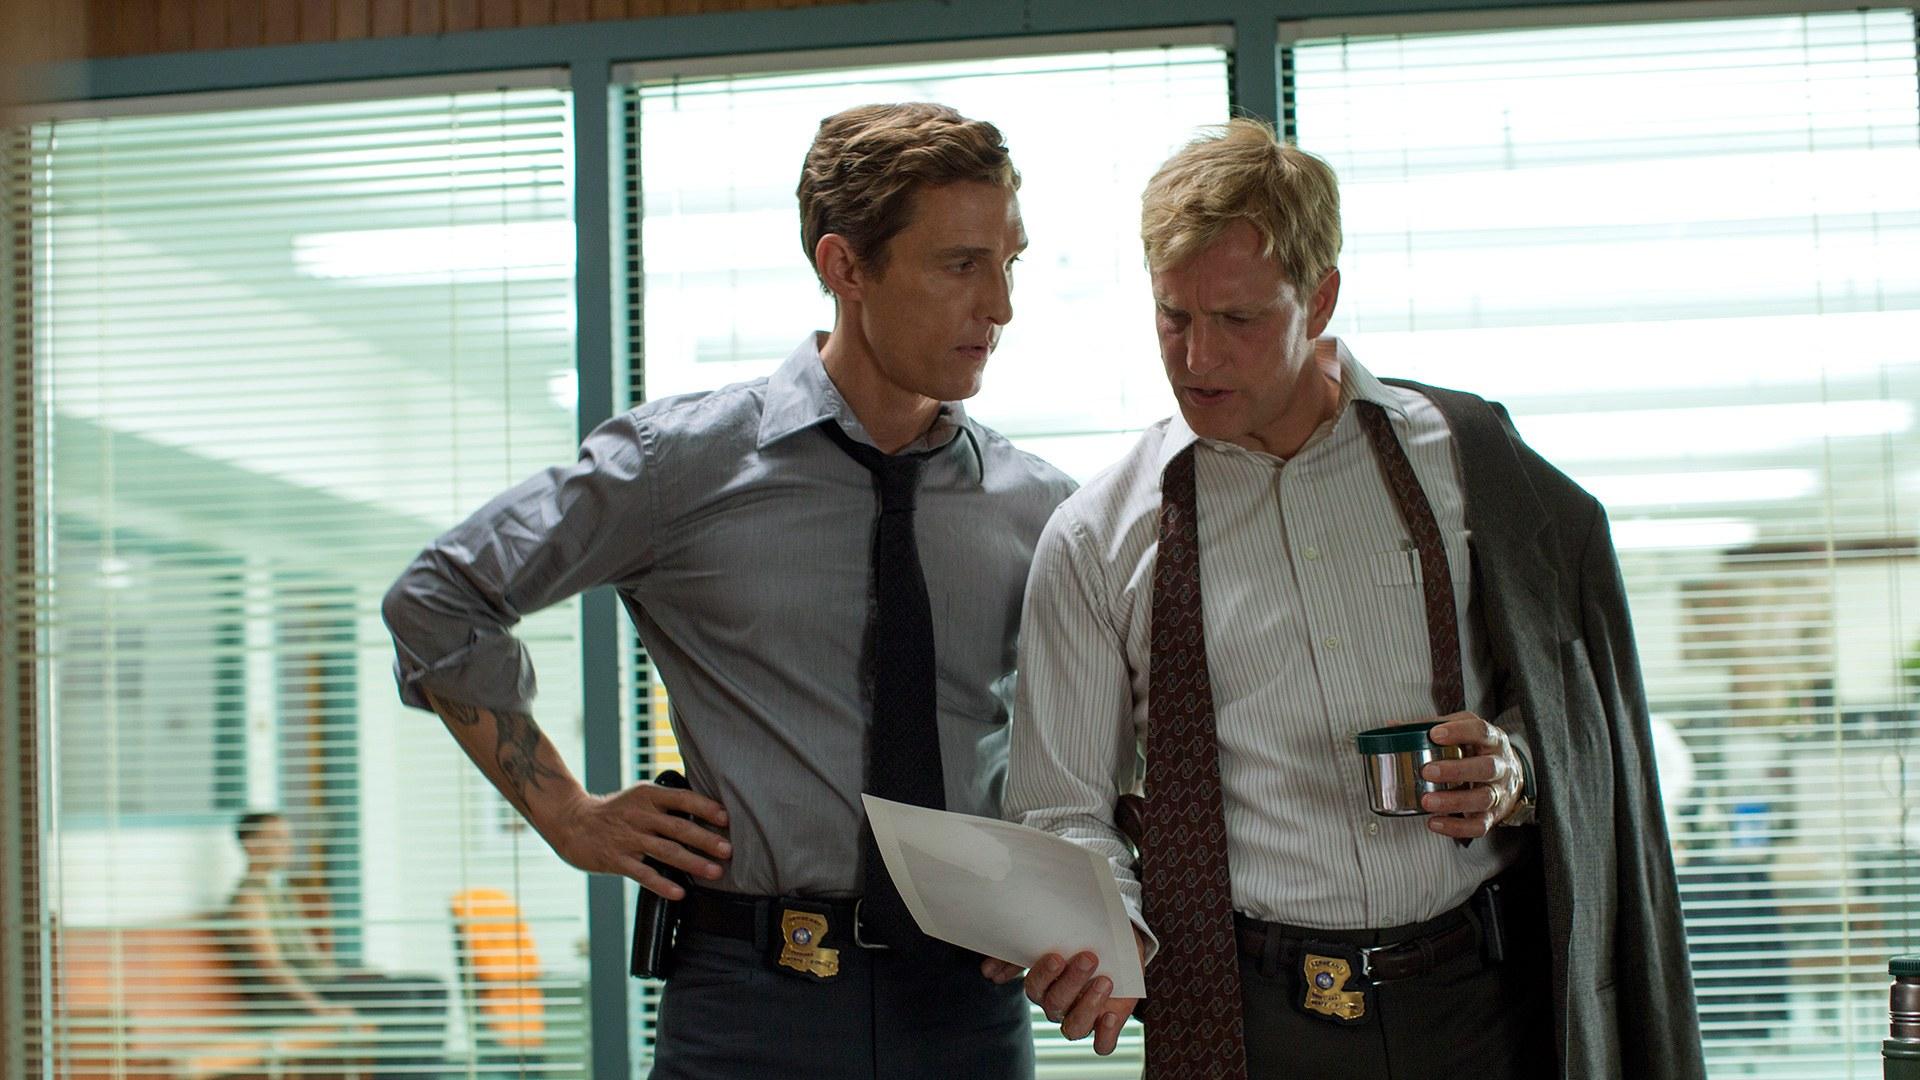 Matthew McConaughey and Woody Harrelson in True Detective Season 1 in an office wearing ties